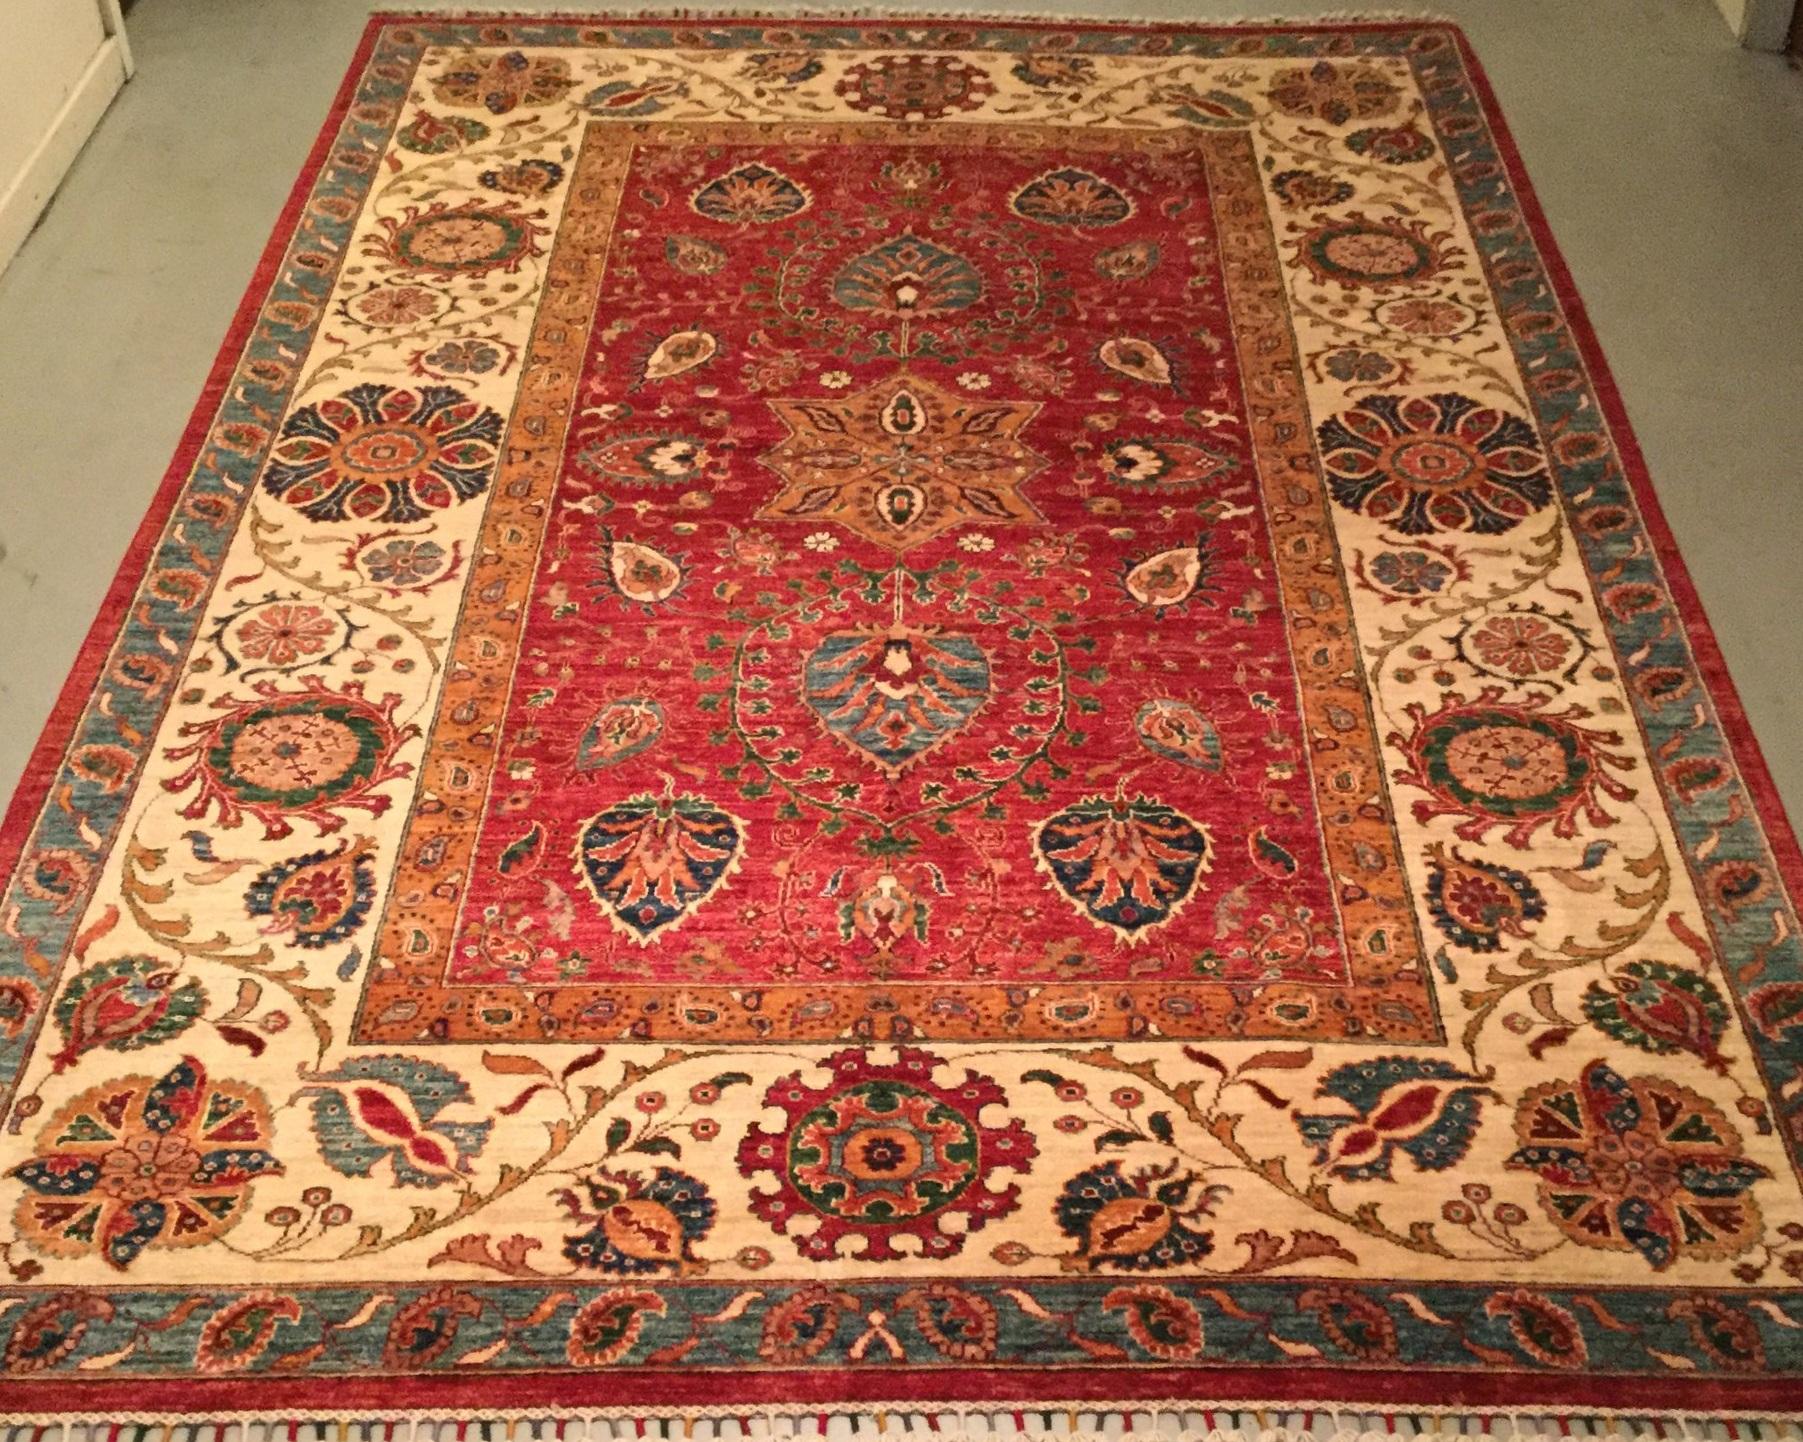 Traditional Afghan Kazak    Size Measurements: 299cm x 203cm